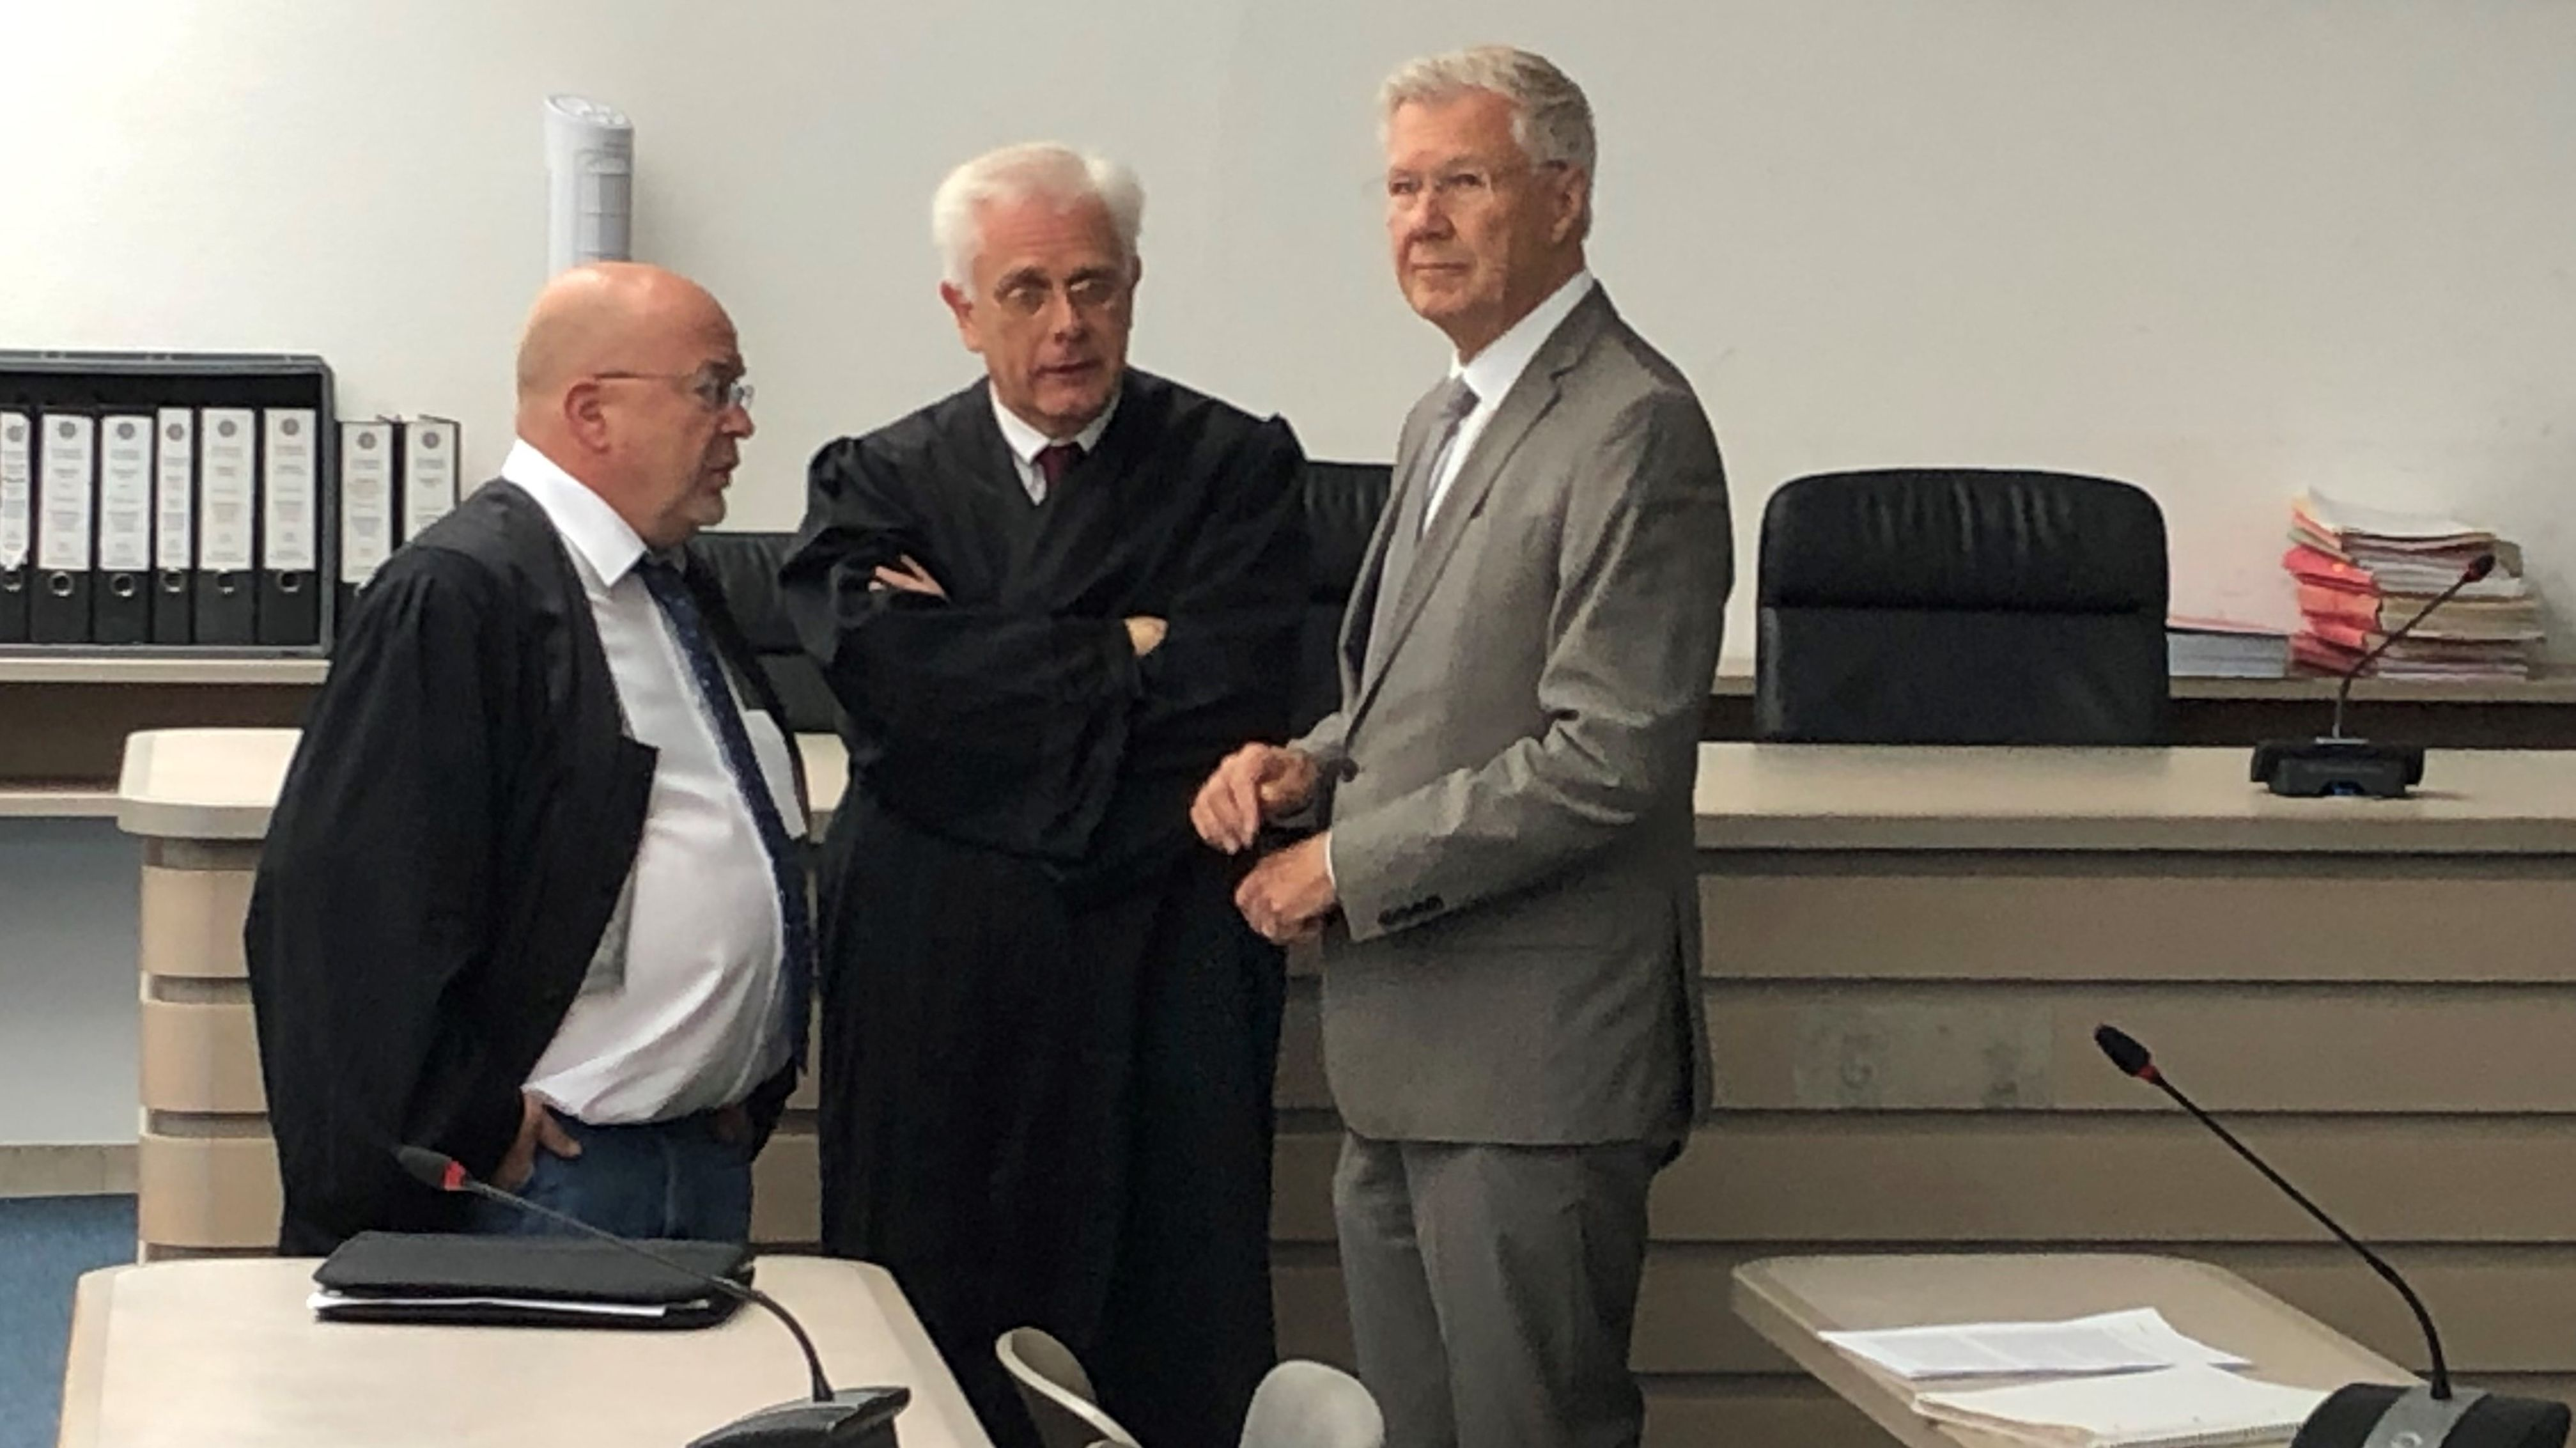 Alt-Oberbürgermeister Alfred Lehmann kurz vor Beginn der Plädoyers im Bestechungsprozess.